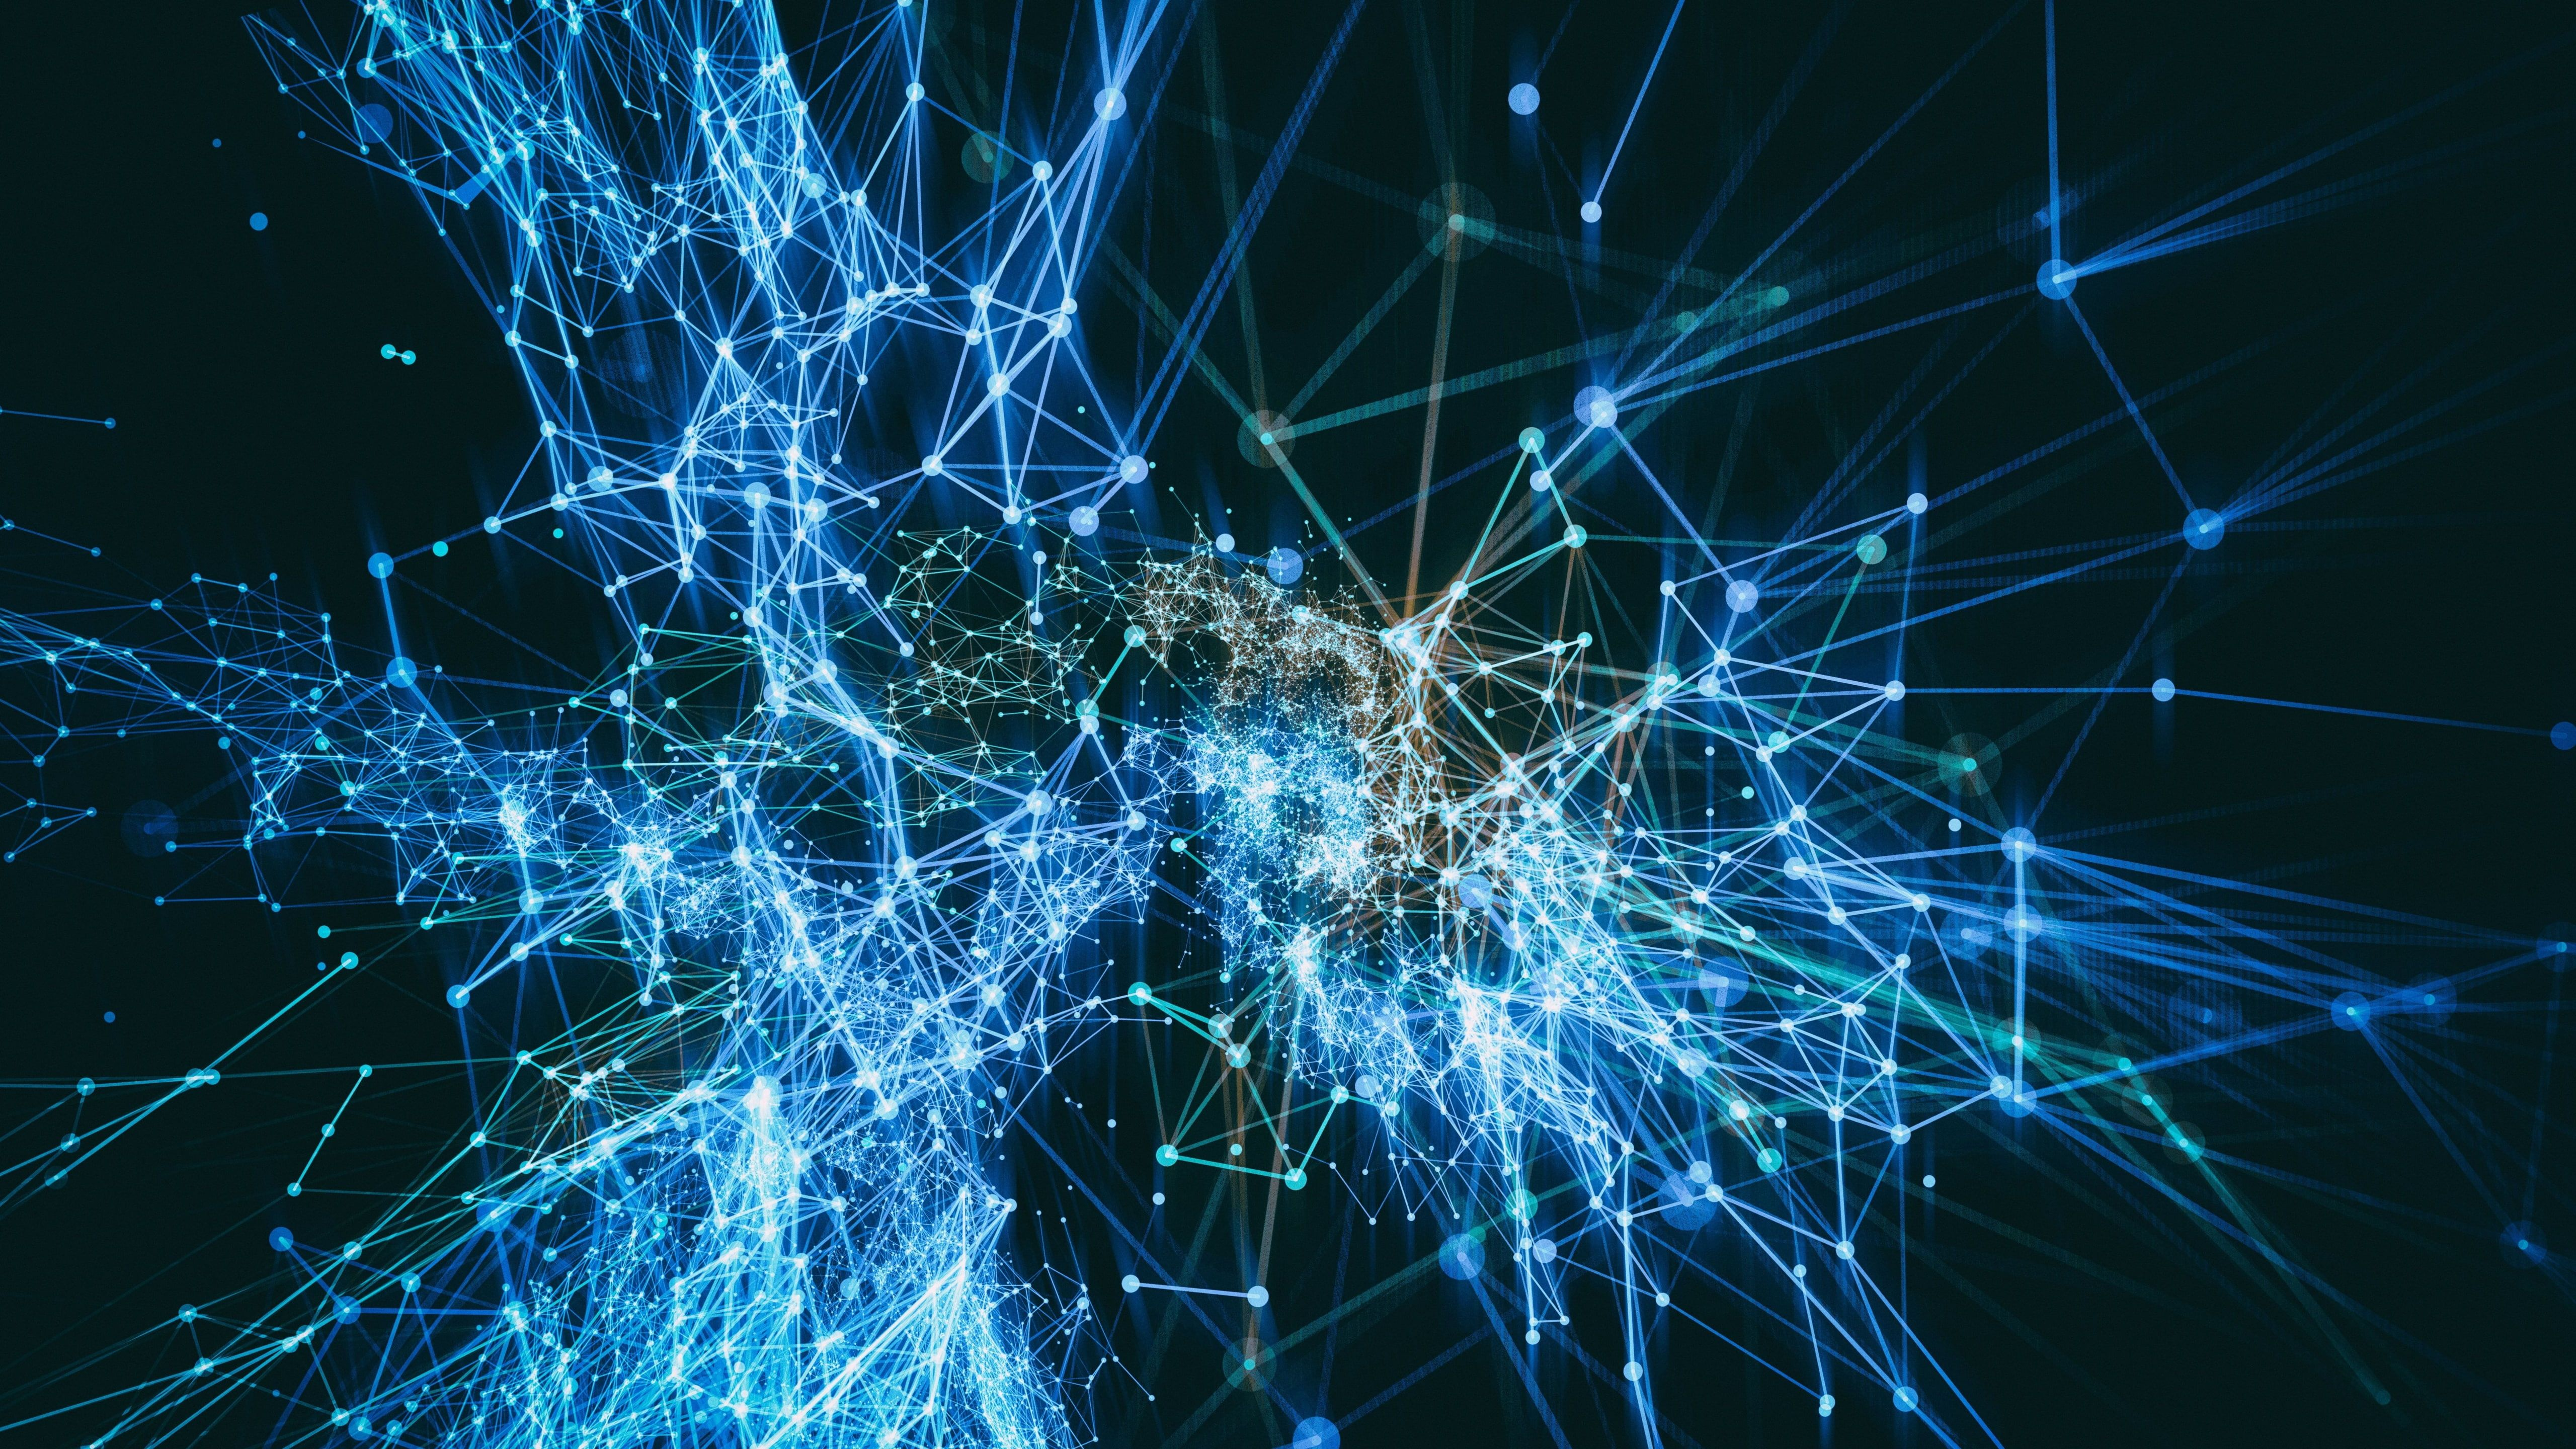 5k Uhd Blue Light Network System Fractal Art Net Meshes Digital Art 5k Line Electric Blue Darkness 5k Wallpaper Hd Fractal Art Fractals Digital Art